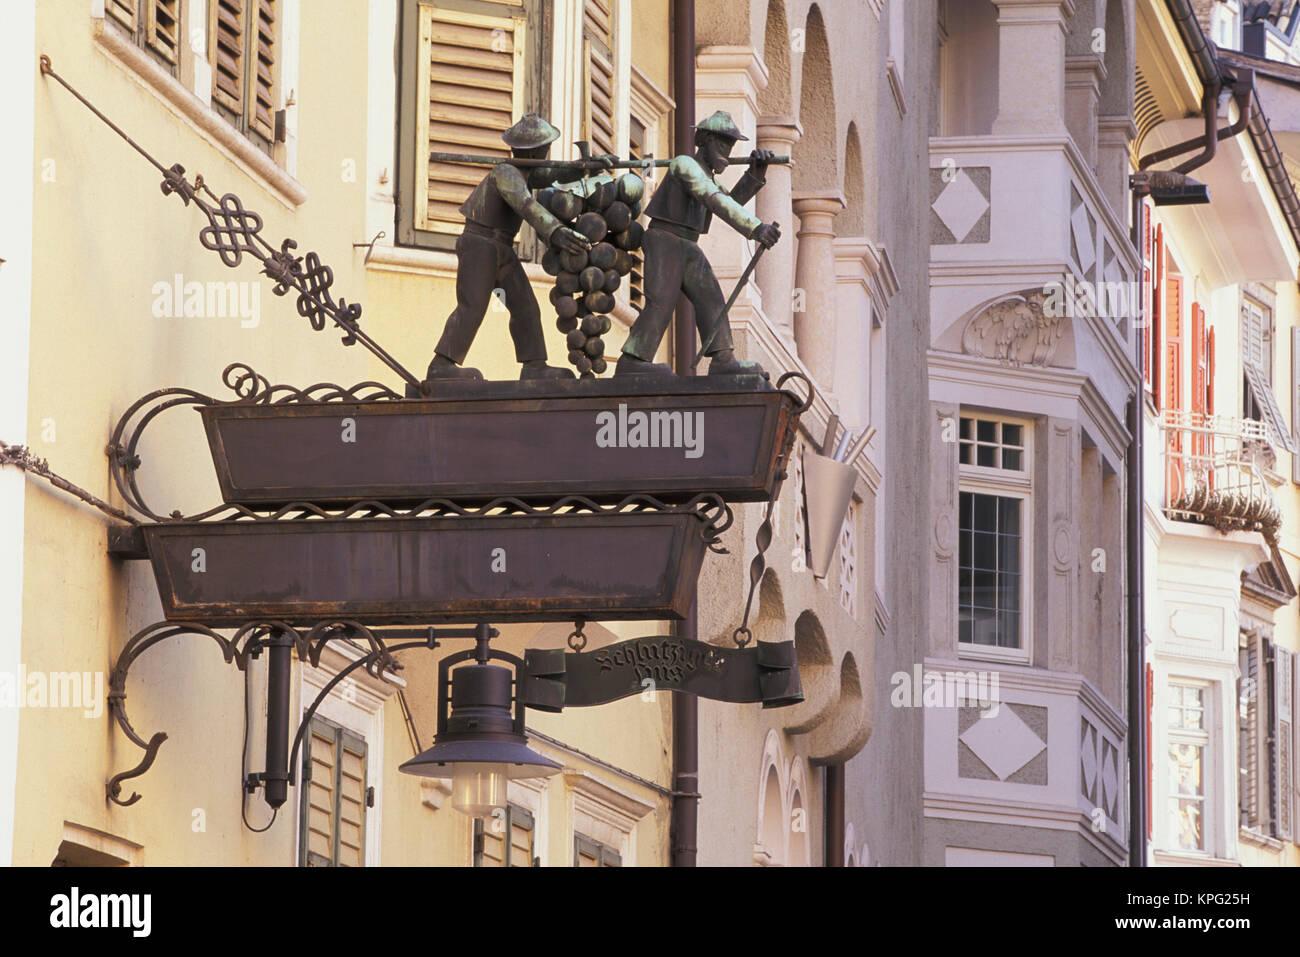 Italy, Bolzano. Traditional hand crafted sign - Stock Image